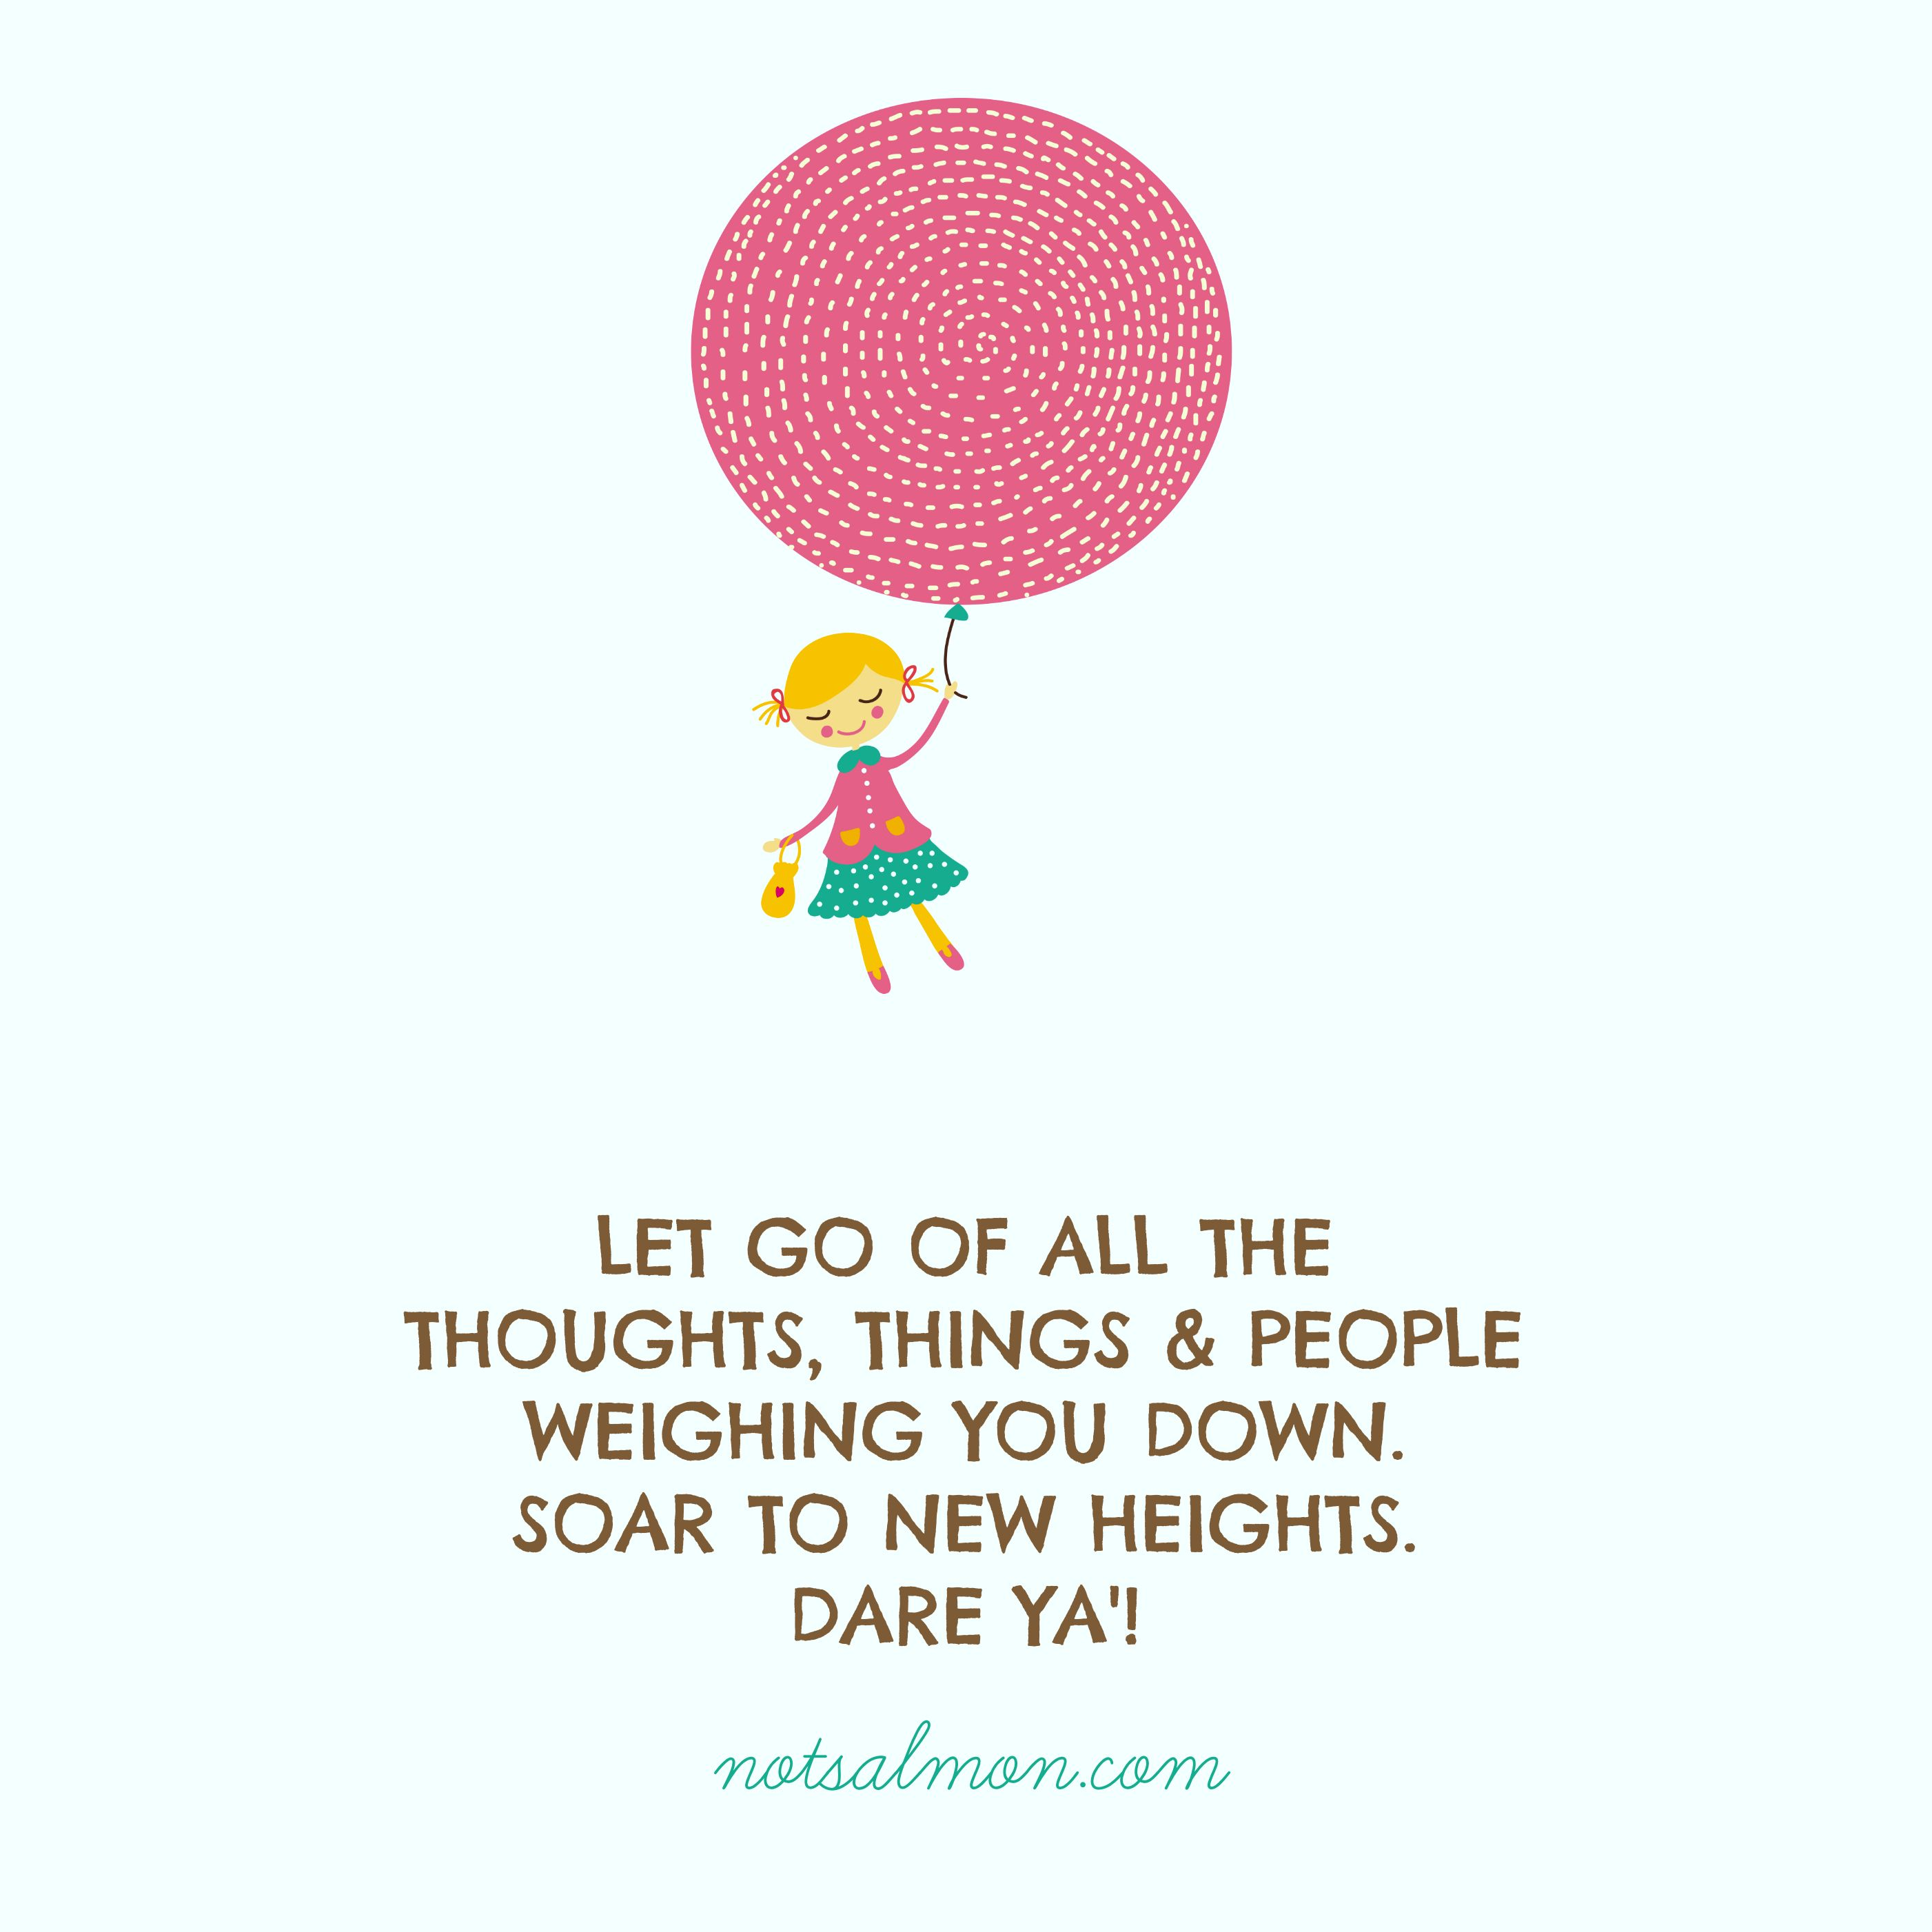 Notsalmon Karen Salmansohn Courage Quotes Words Of Encouragement Height Quotes